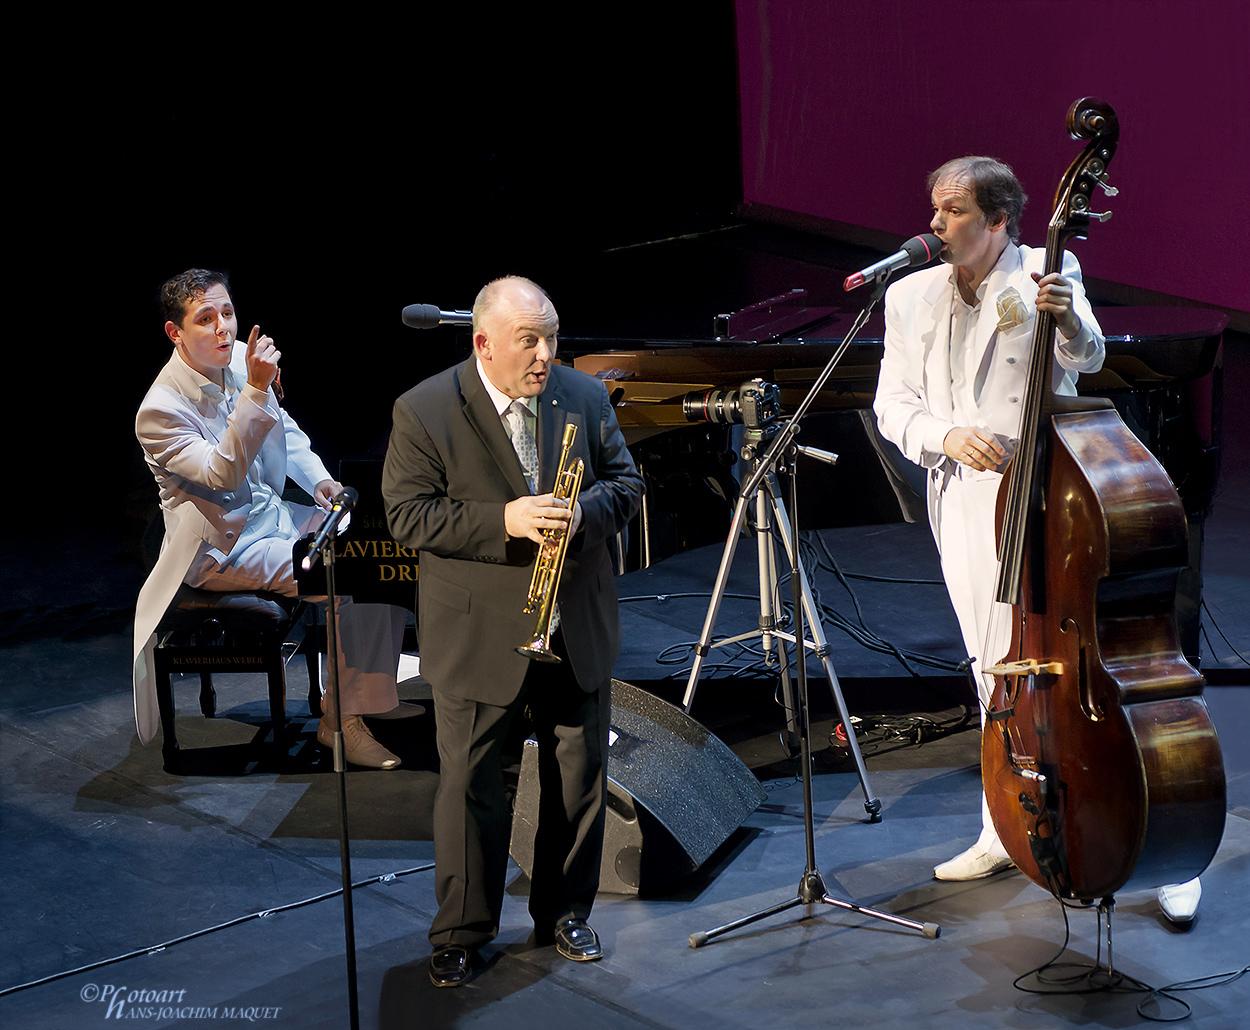 Bruno Böhmer-Camacho, James Morrison, Kilian Forster